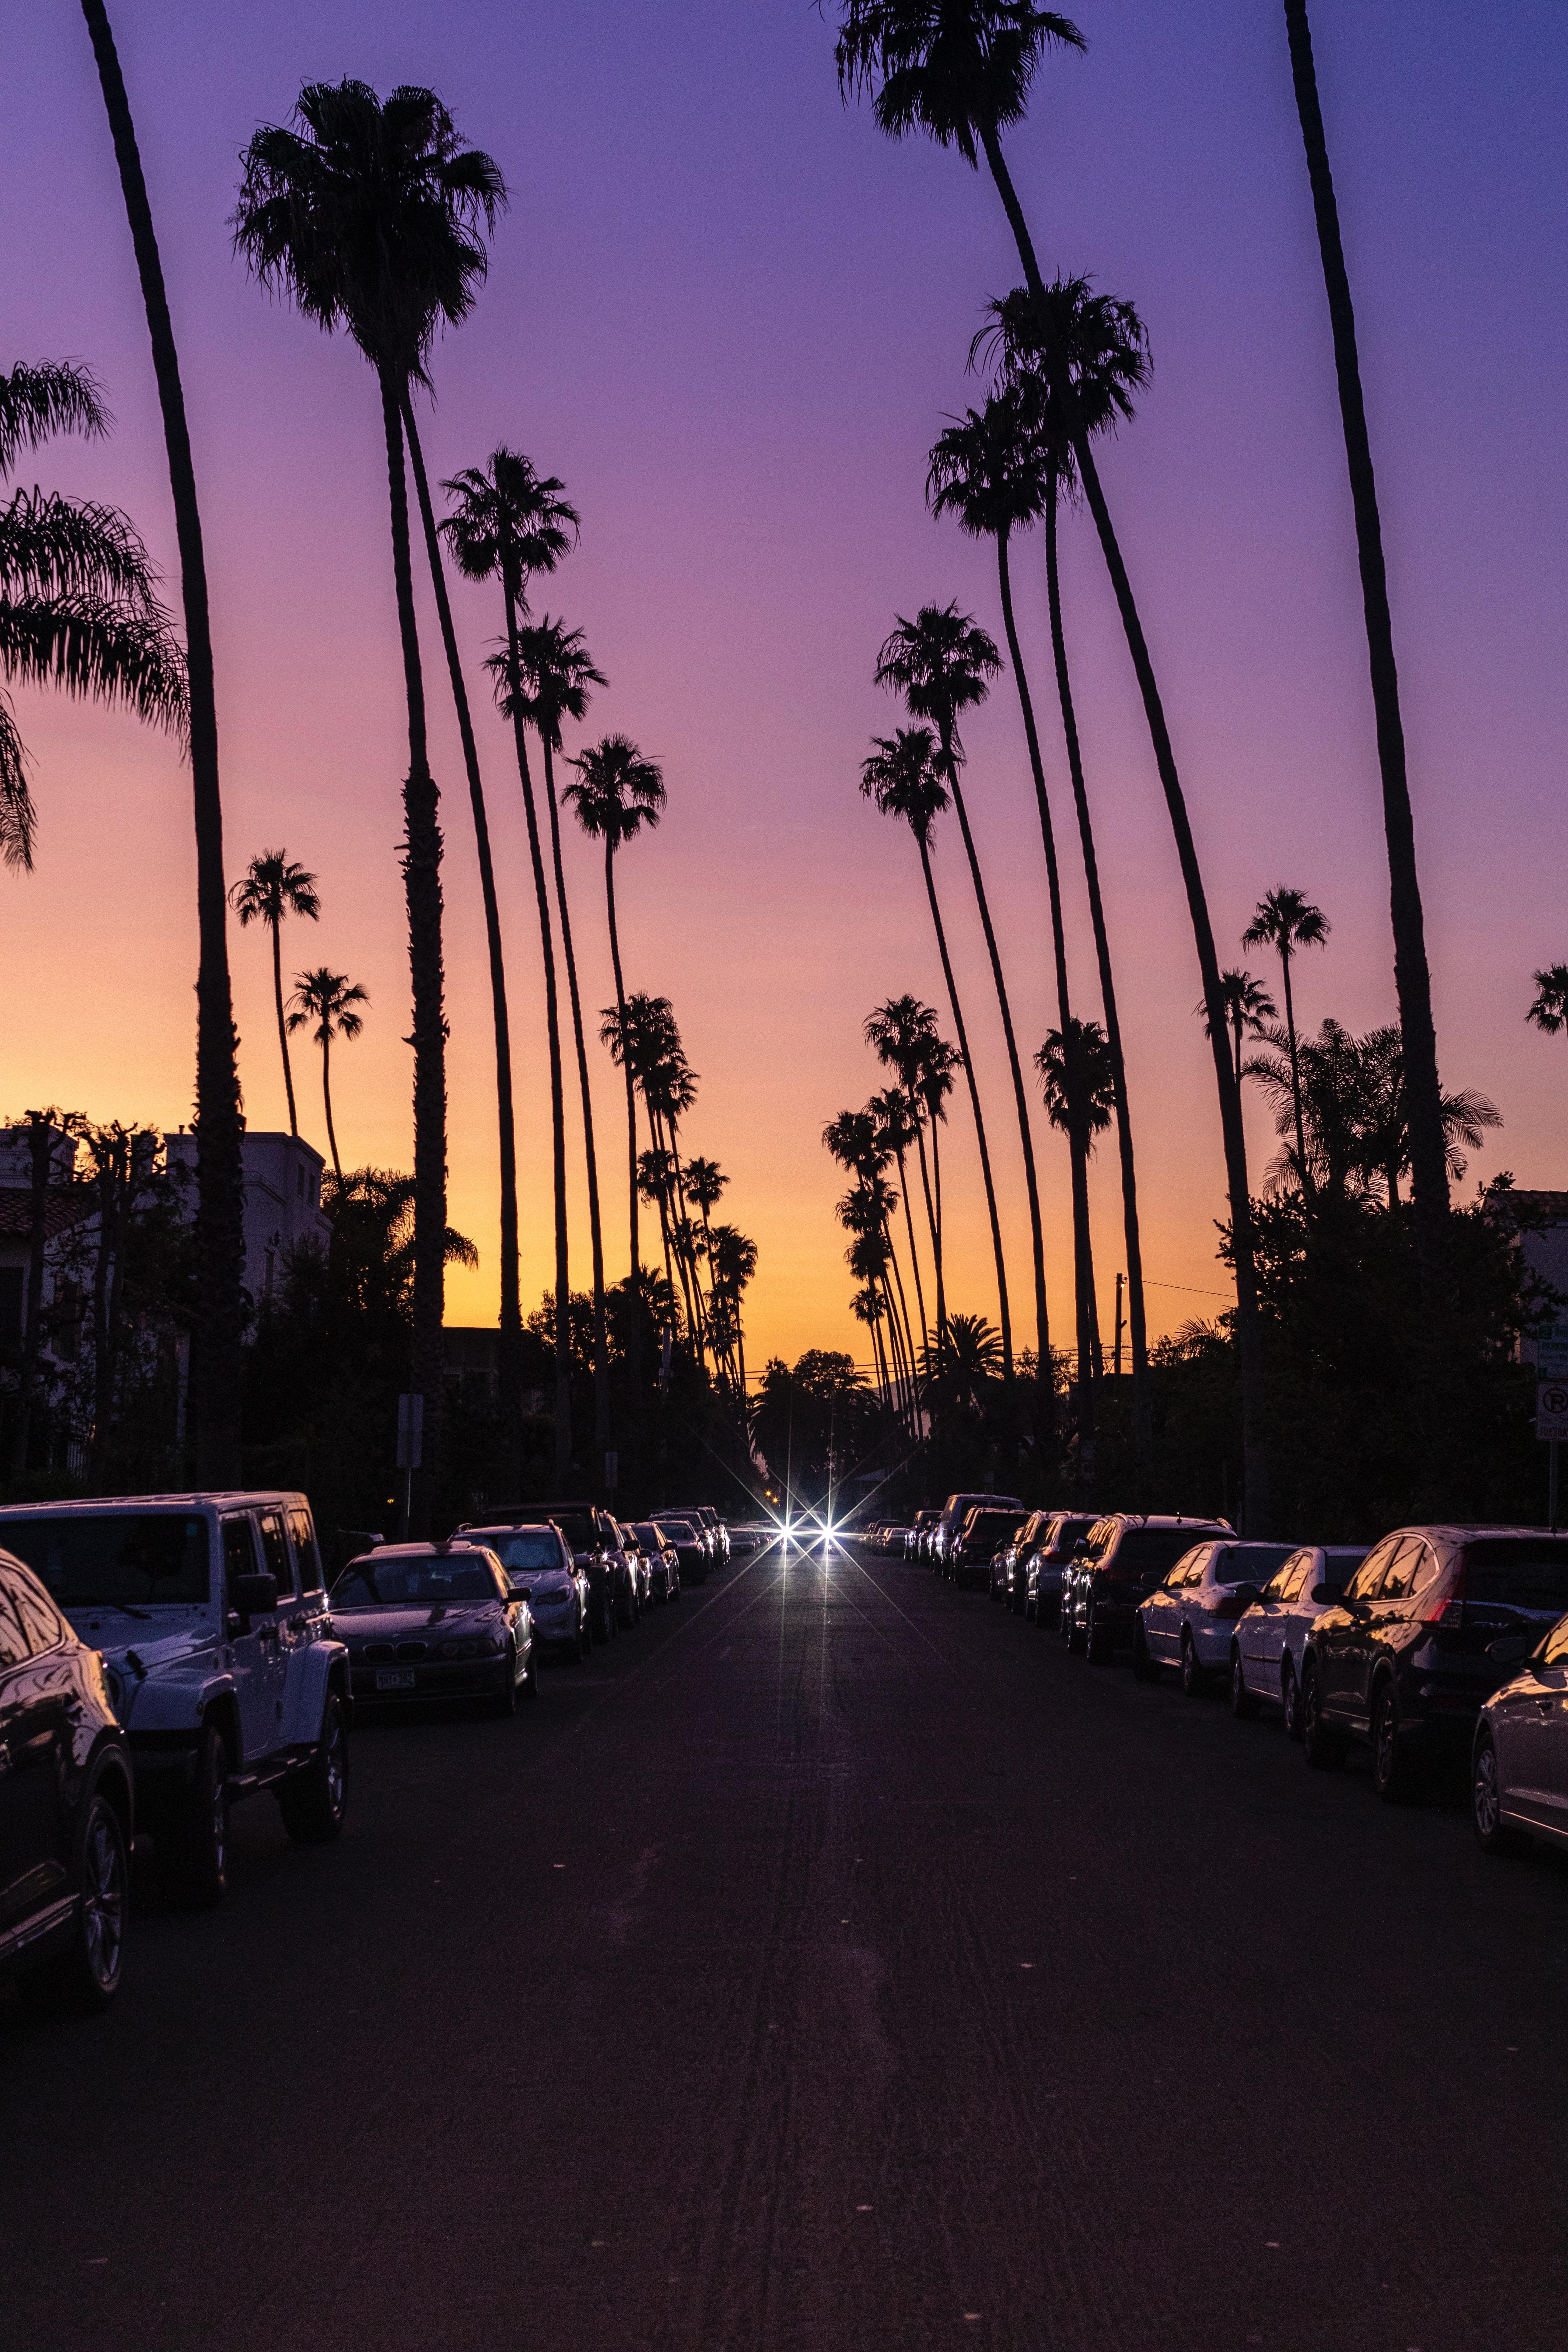 19. Santa Monica, California daniel-schludi-t6JpiIWLLp8-unsplash